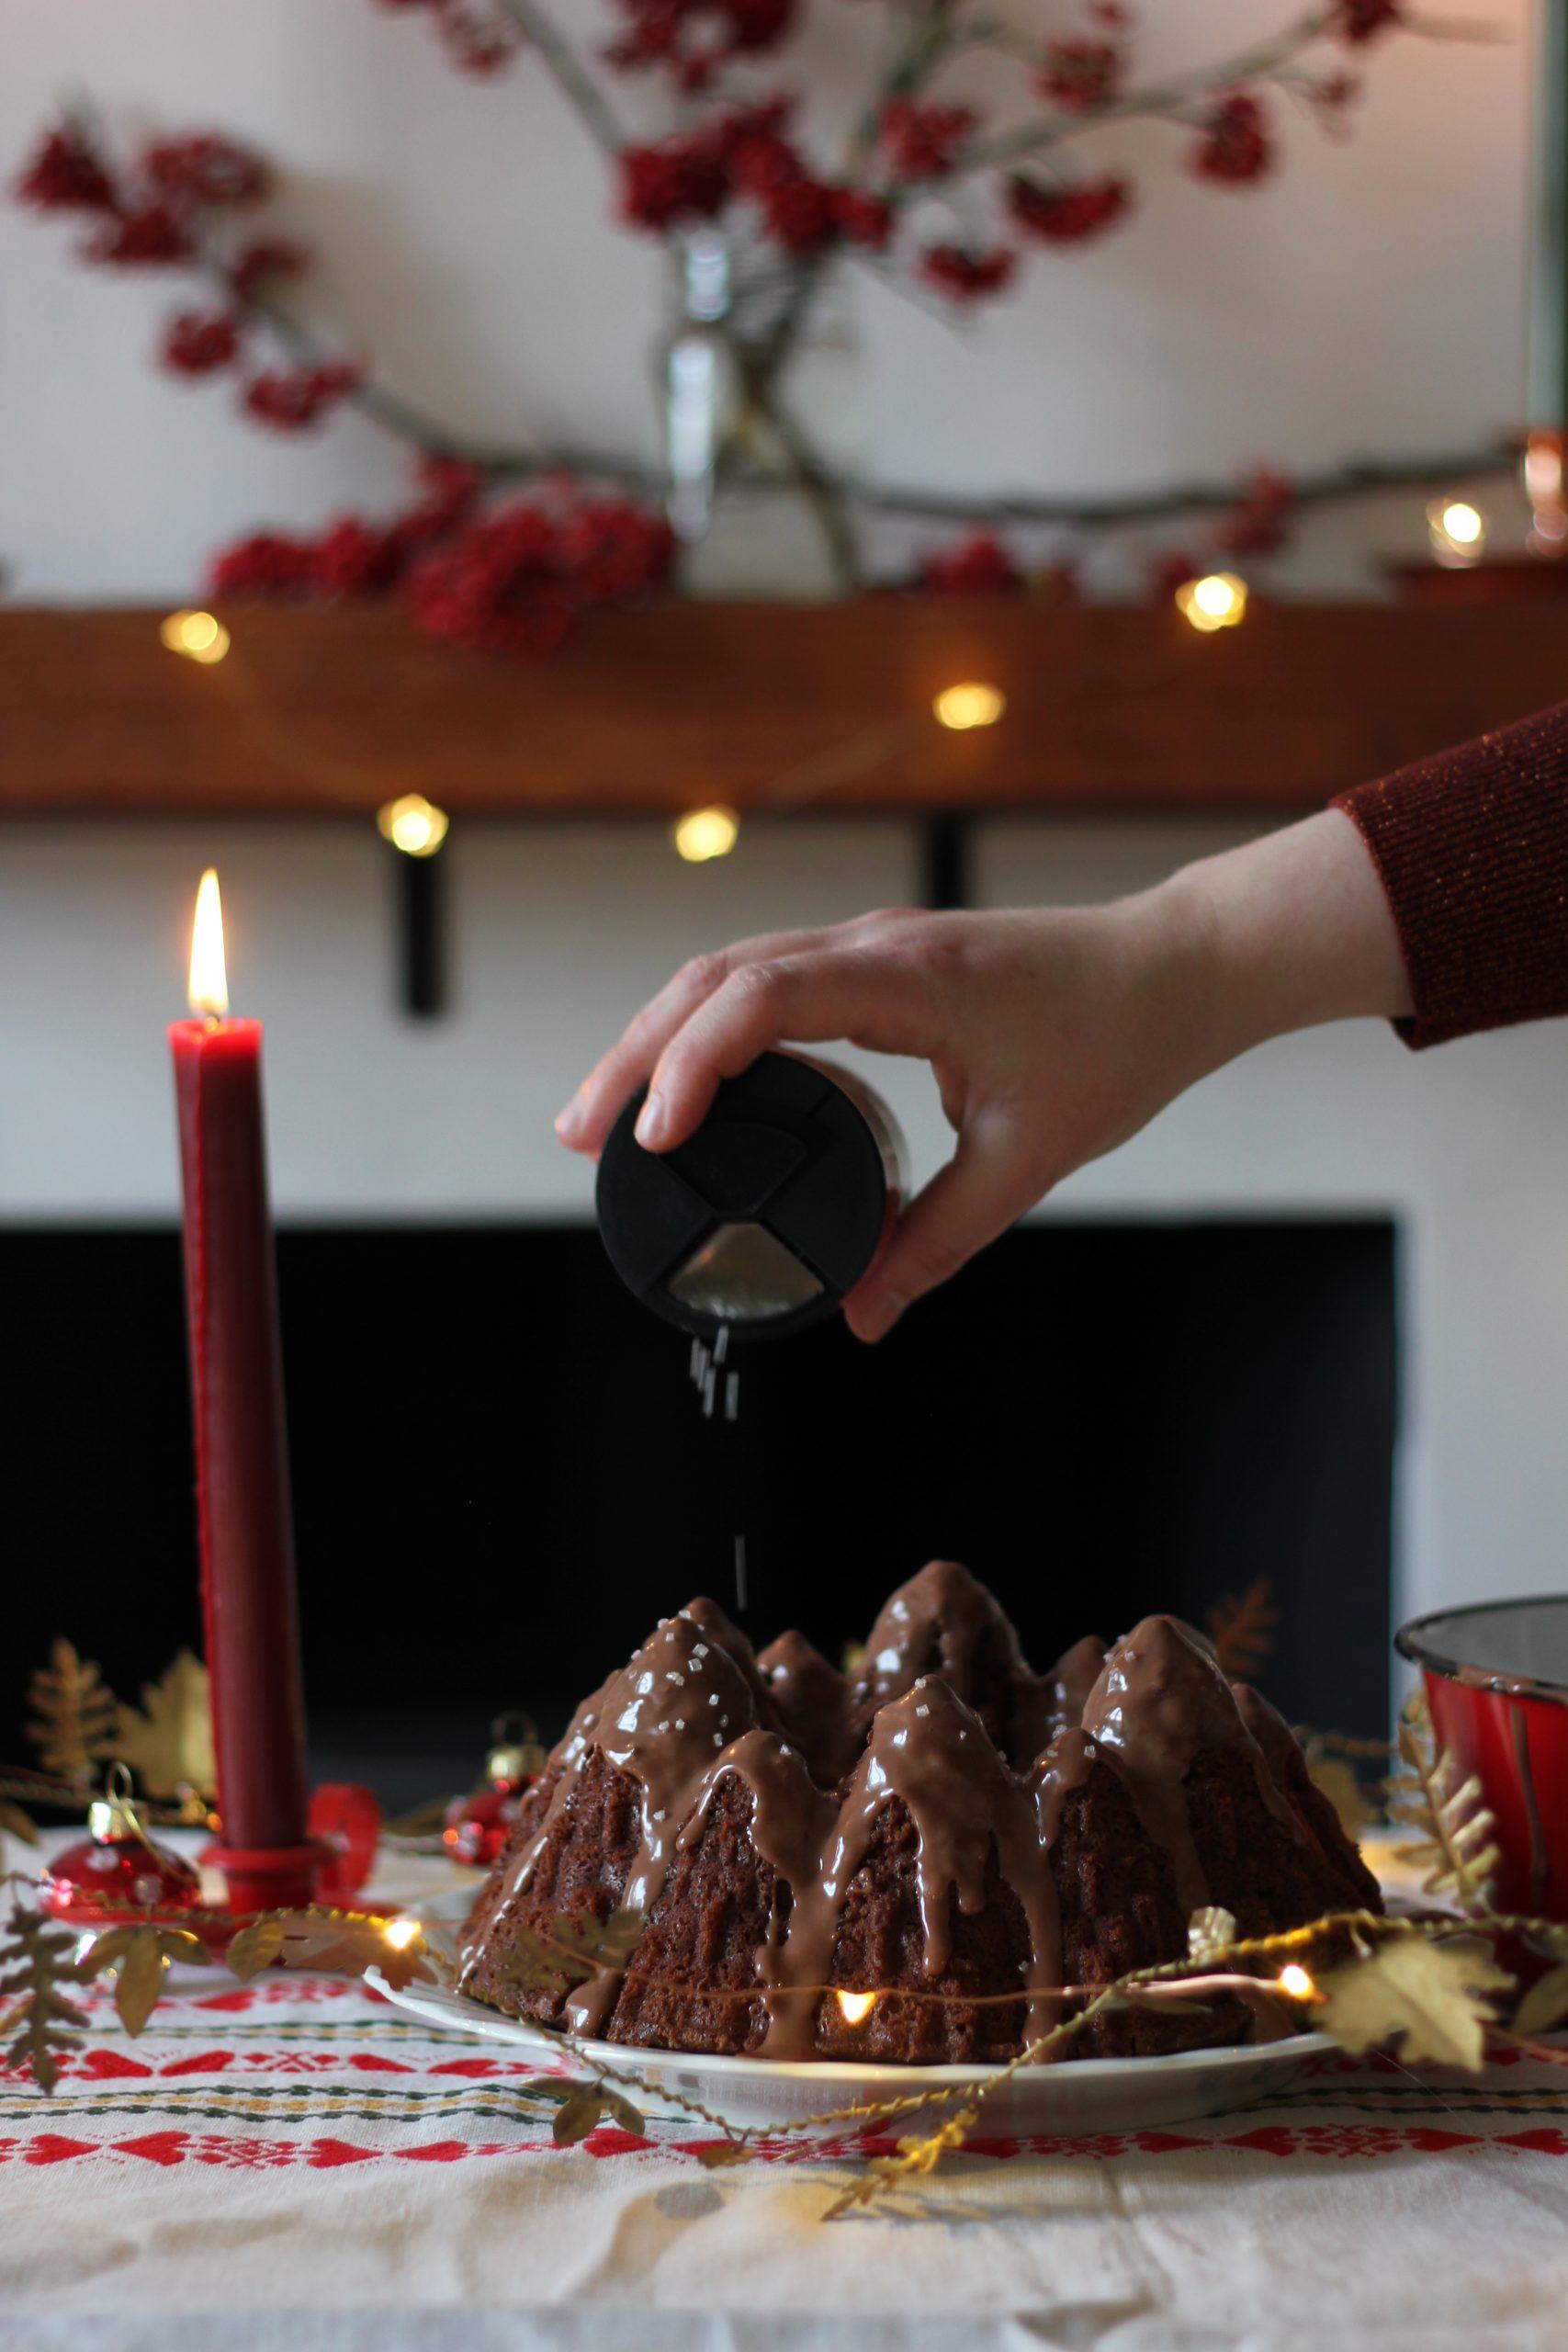 Chocolate peppermint bundt